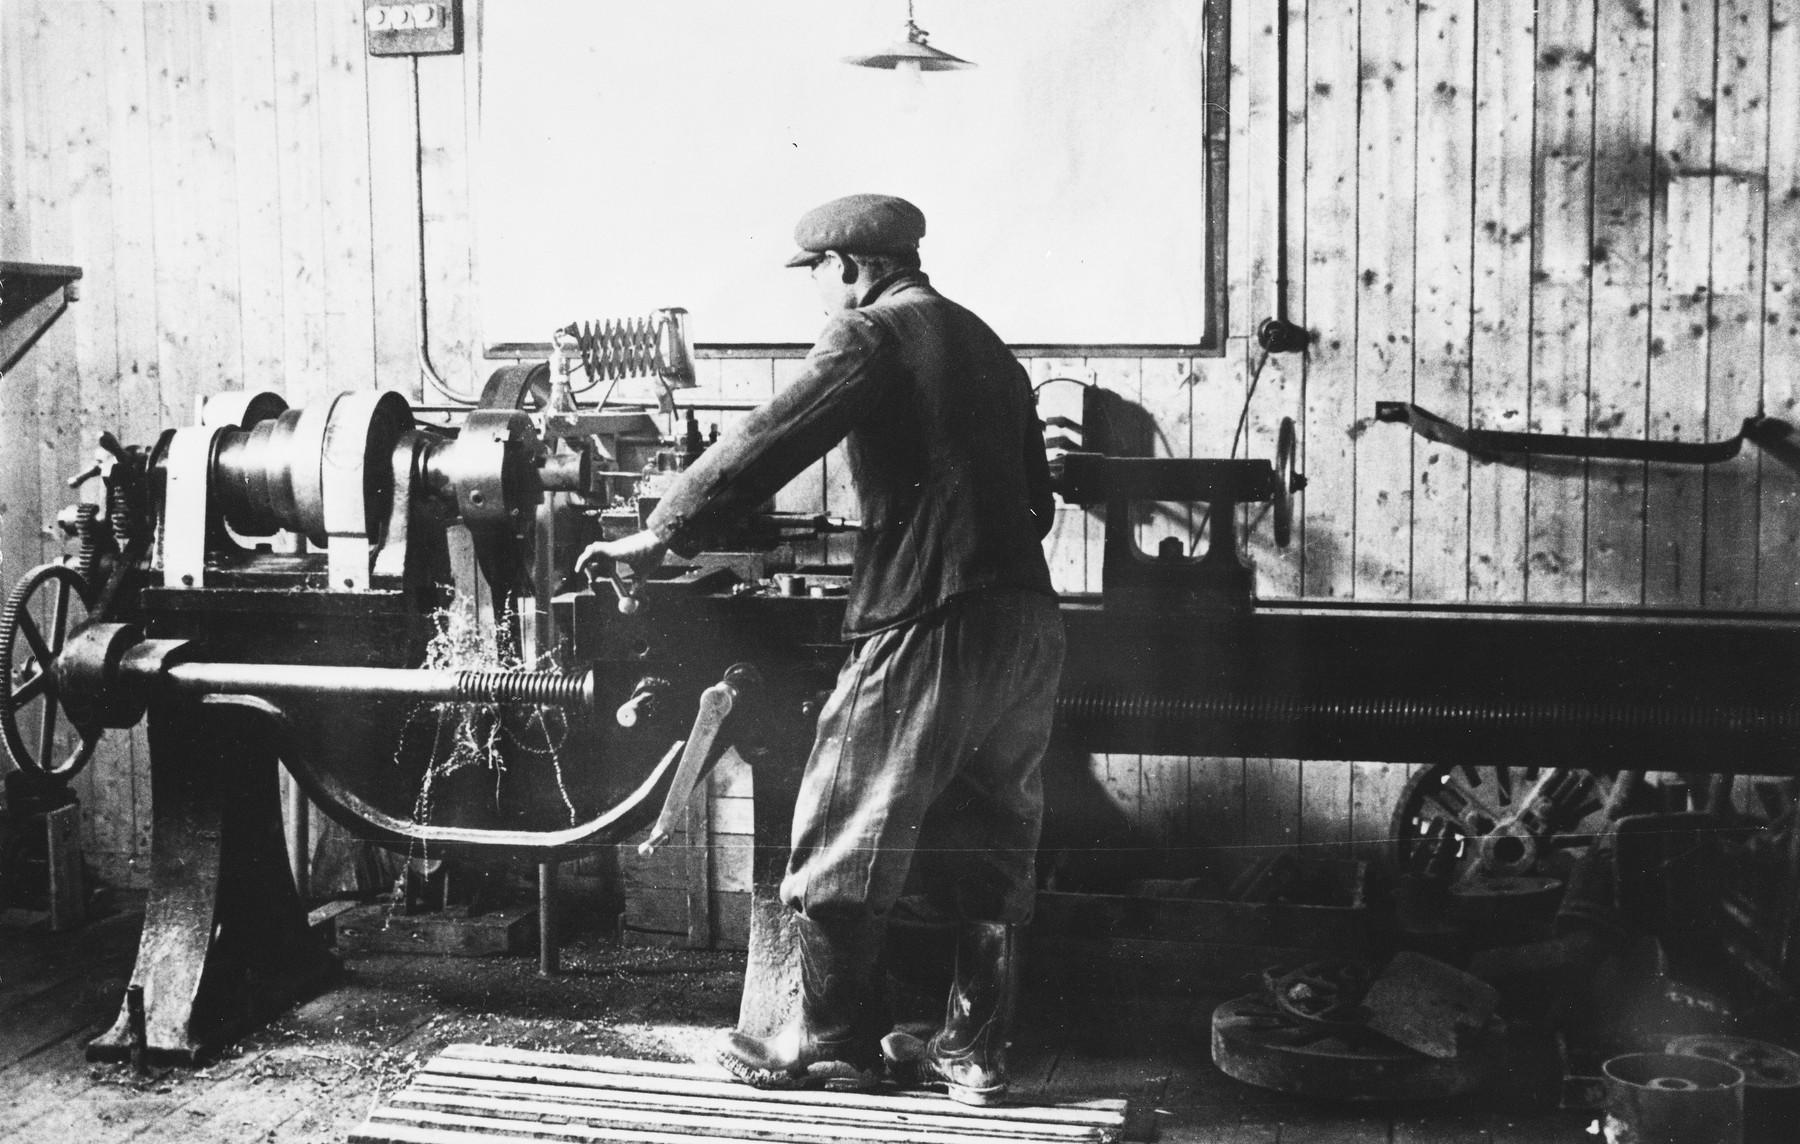 Prisoners work in a machine shop at a Slovak labor camp.